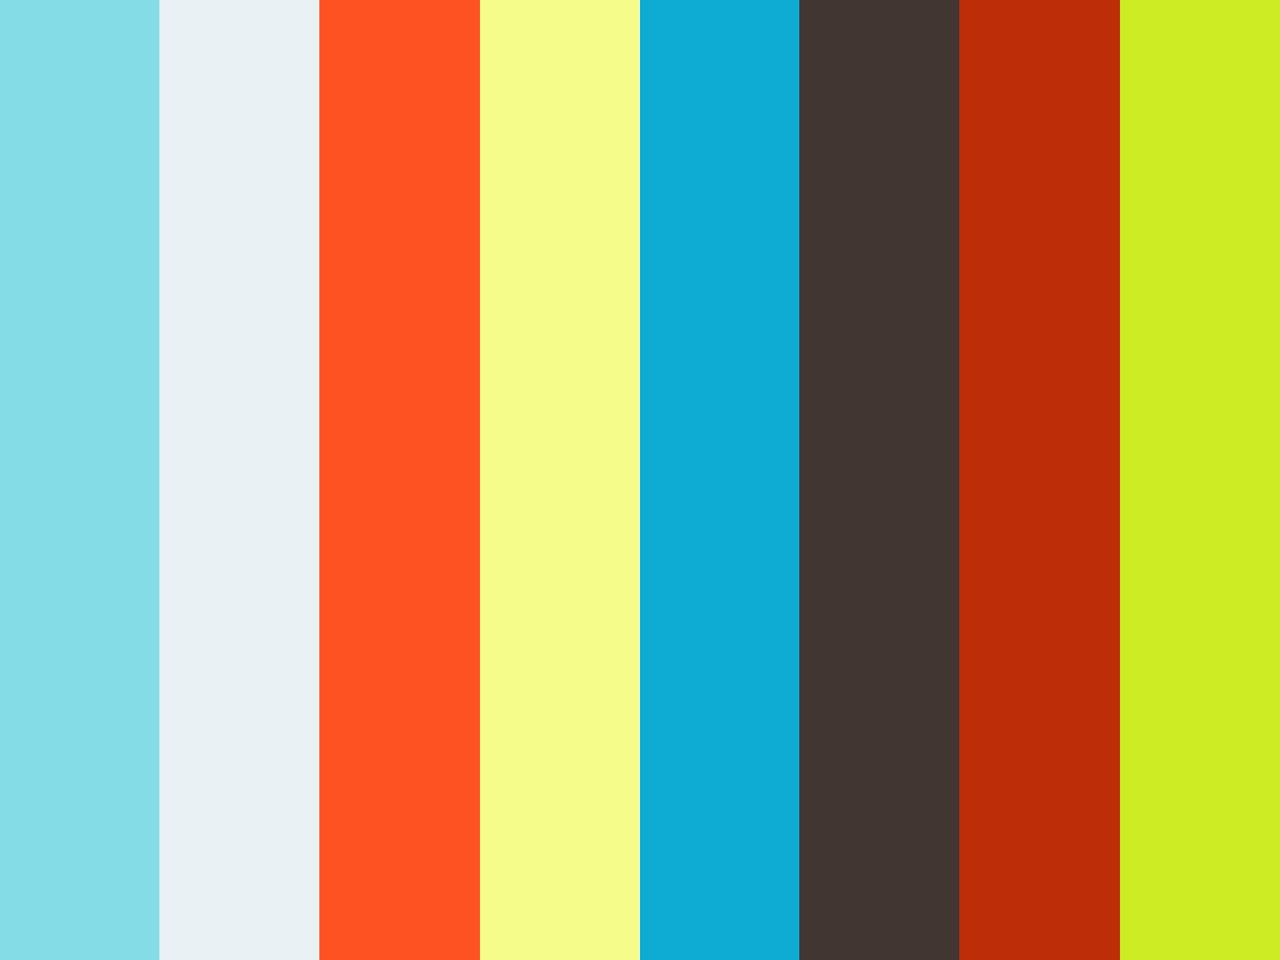 VJ Mix by Alexander Kuiava. VJing VJ Loops - ✅ LIME ART GROUP